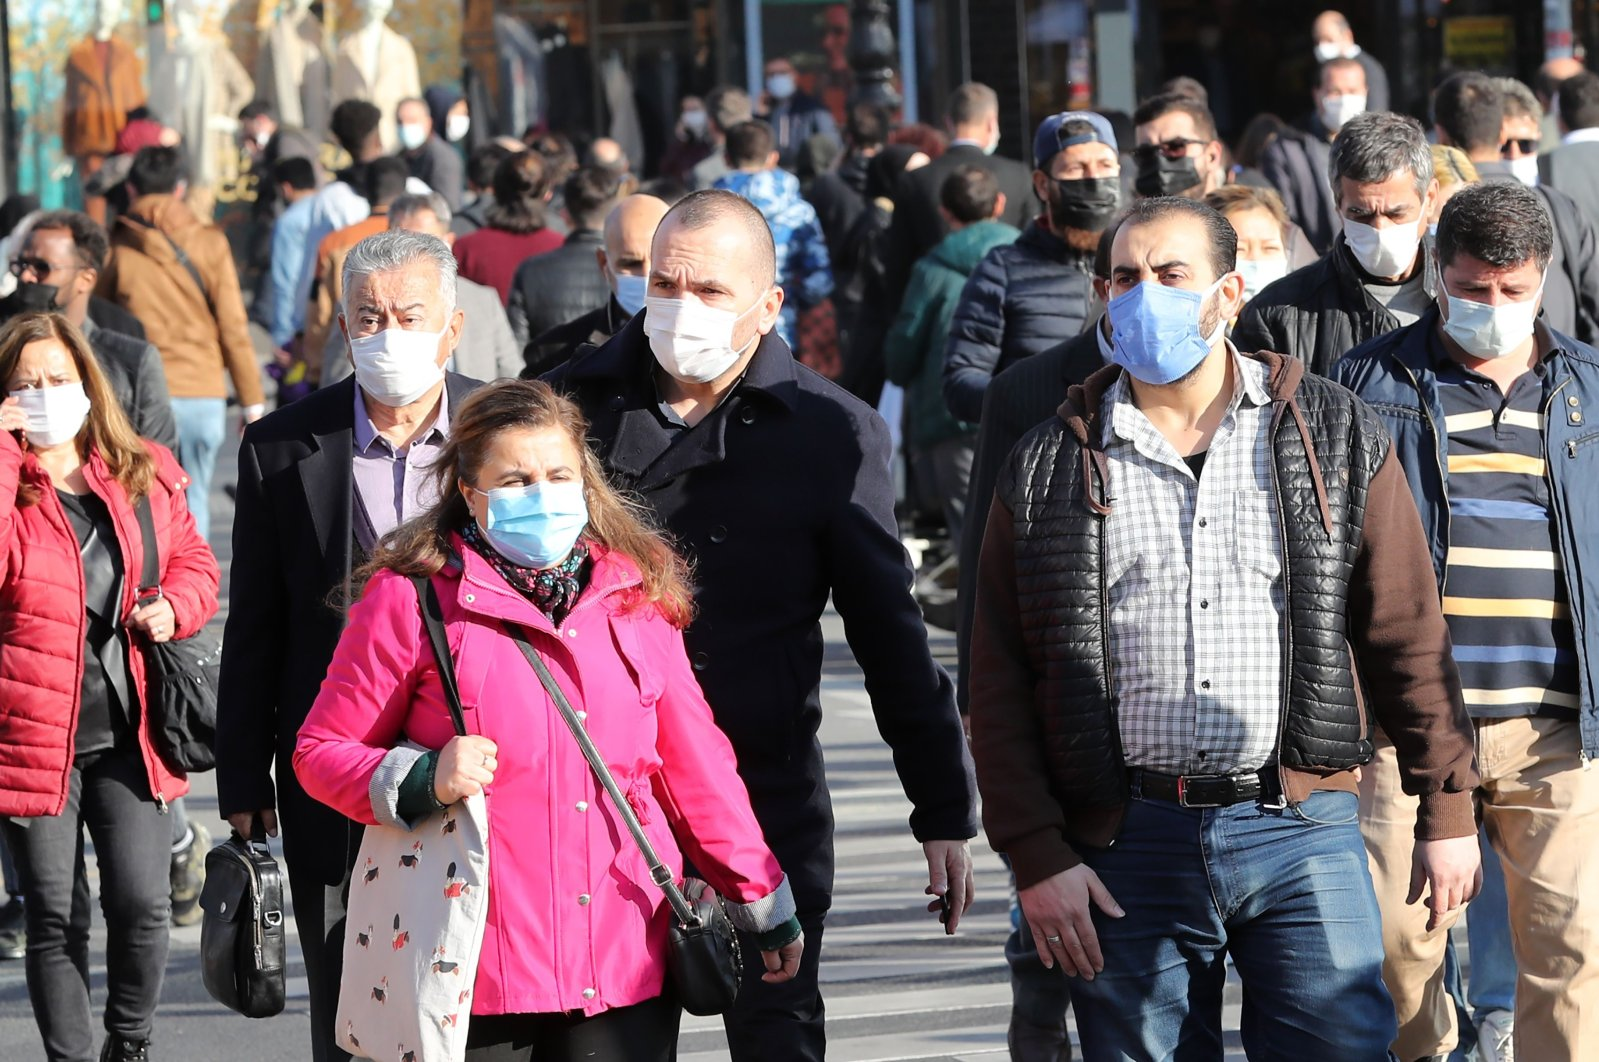 Pedestrians wearing masks walk in the capital Ankara, Turkey, Nov. 13, 2020. (AFP Photo)